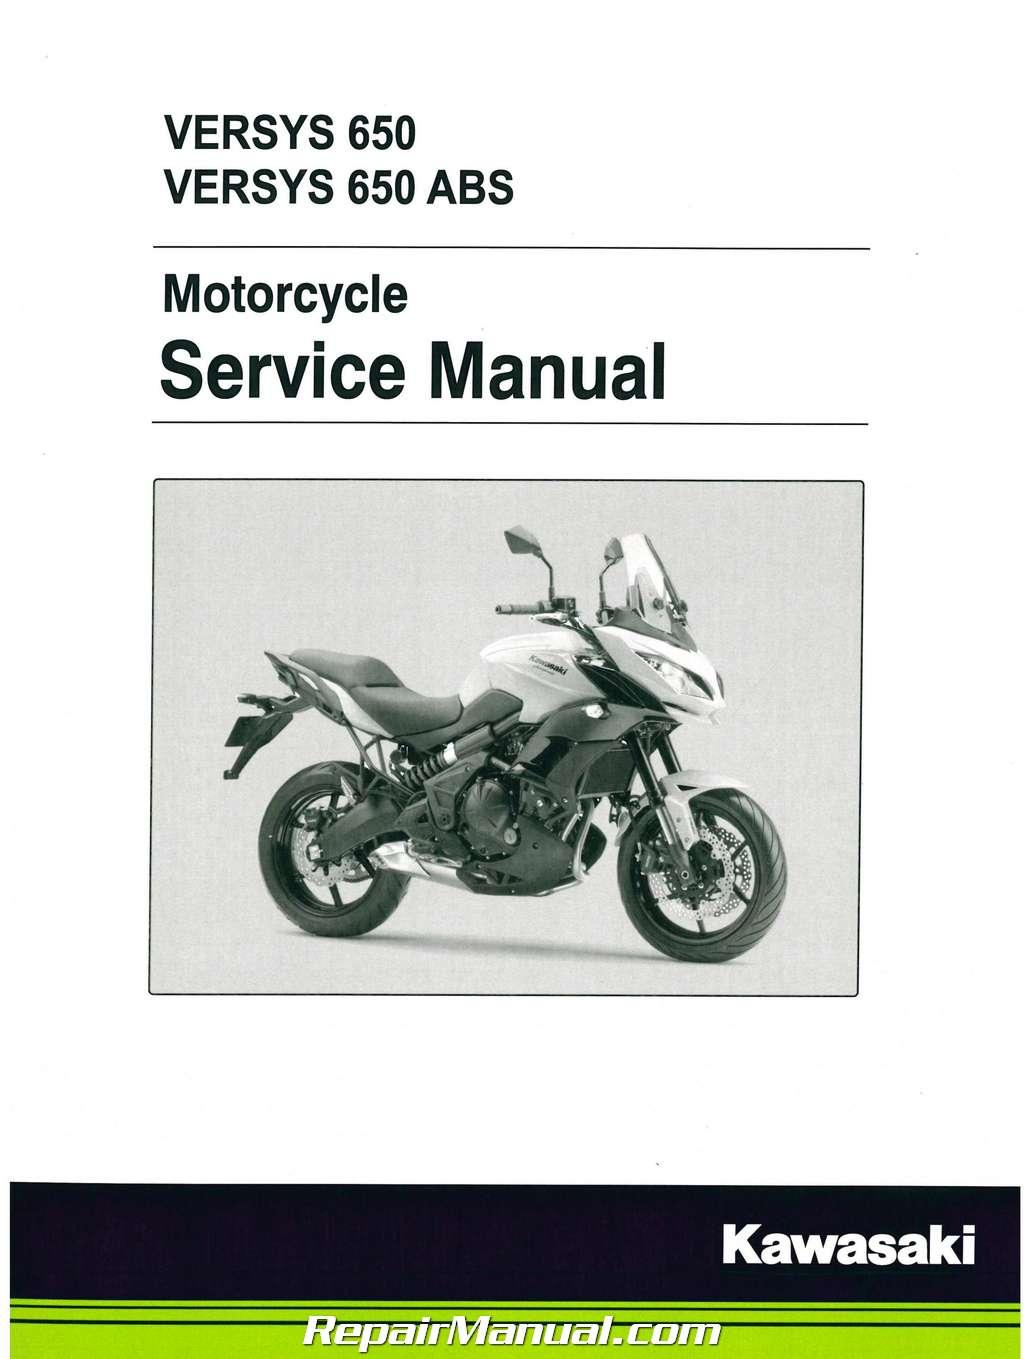 2015 Kawasaki KLE650A Versys / ABS Motorcycle Service Manual